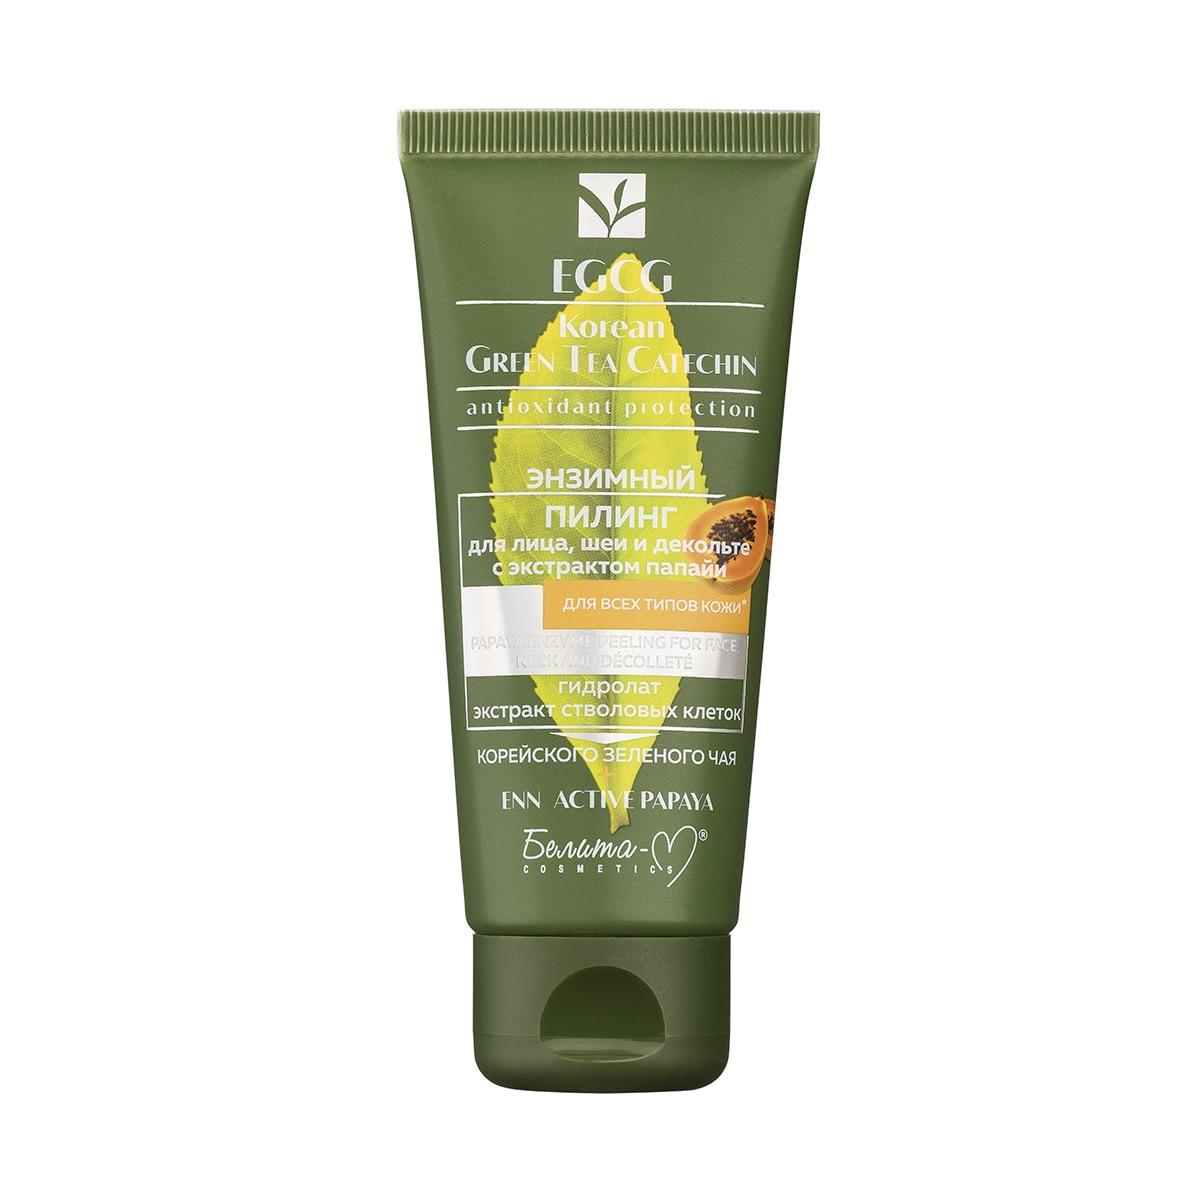 EGCG Korean Green Tea Catechin Enzyme Peeling With Papaya For All Skin Types 60g Facial Scrub Face Hands Body Peeling